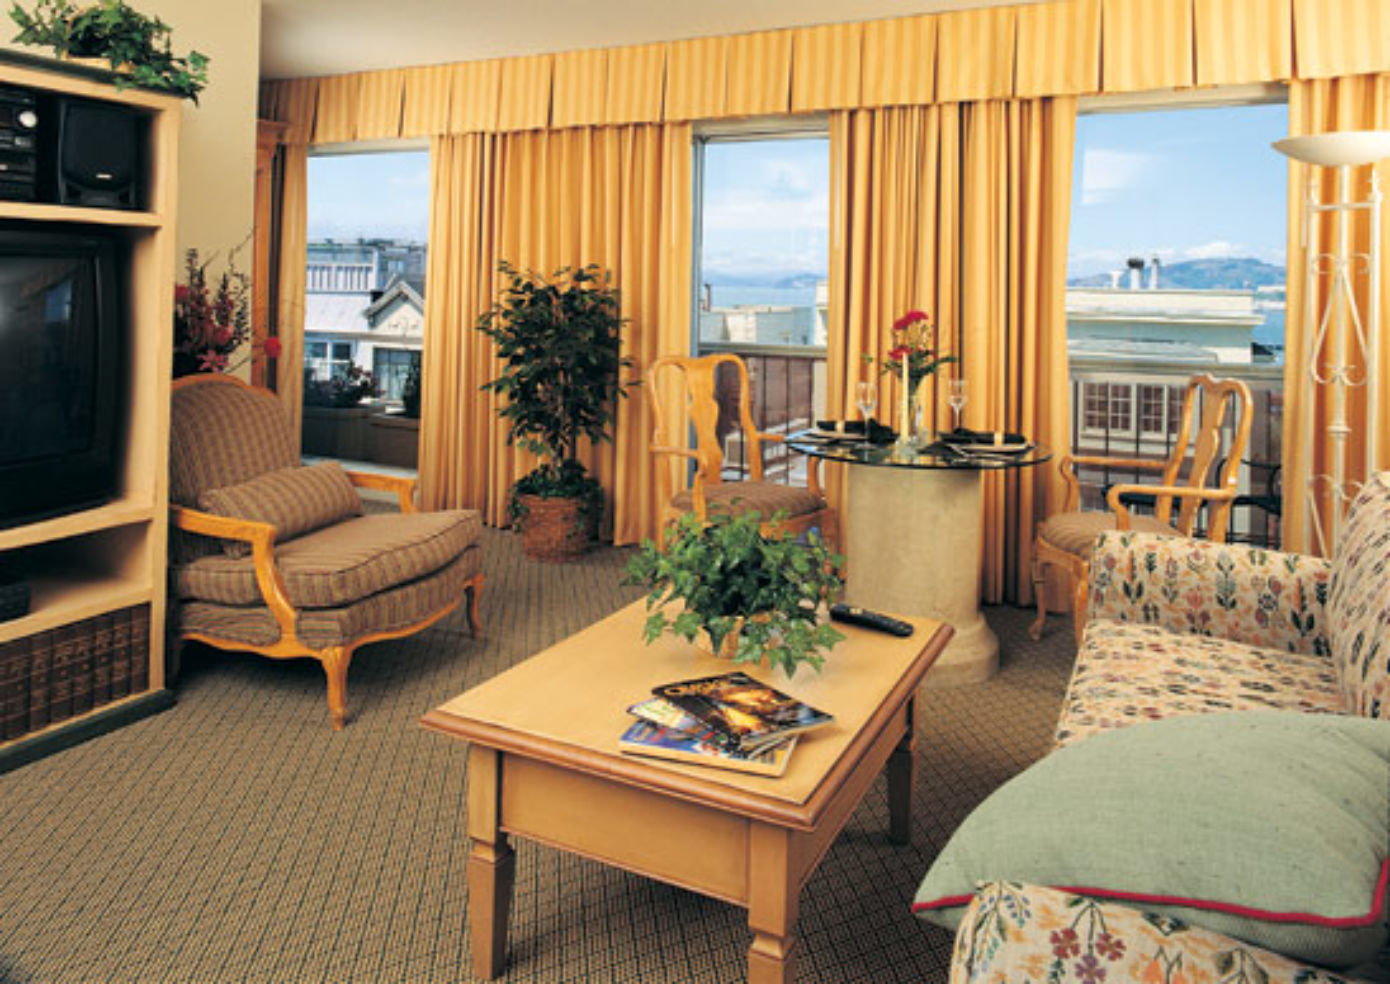 Living room at Suites at Fisherman's Wharf